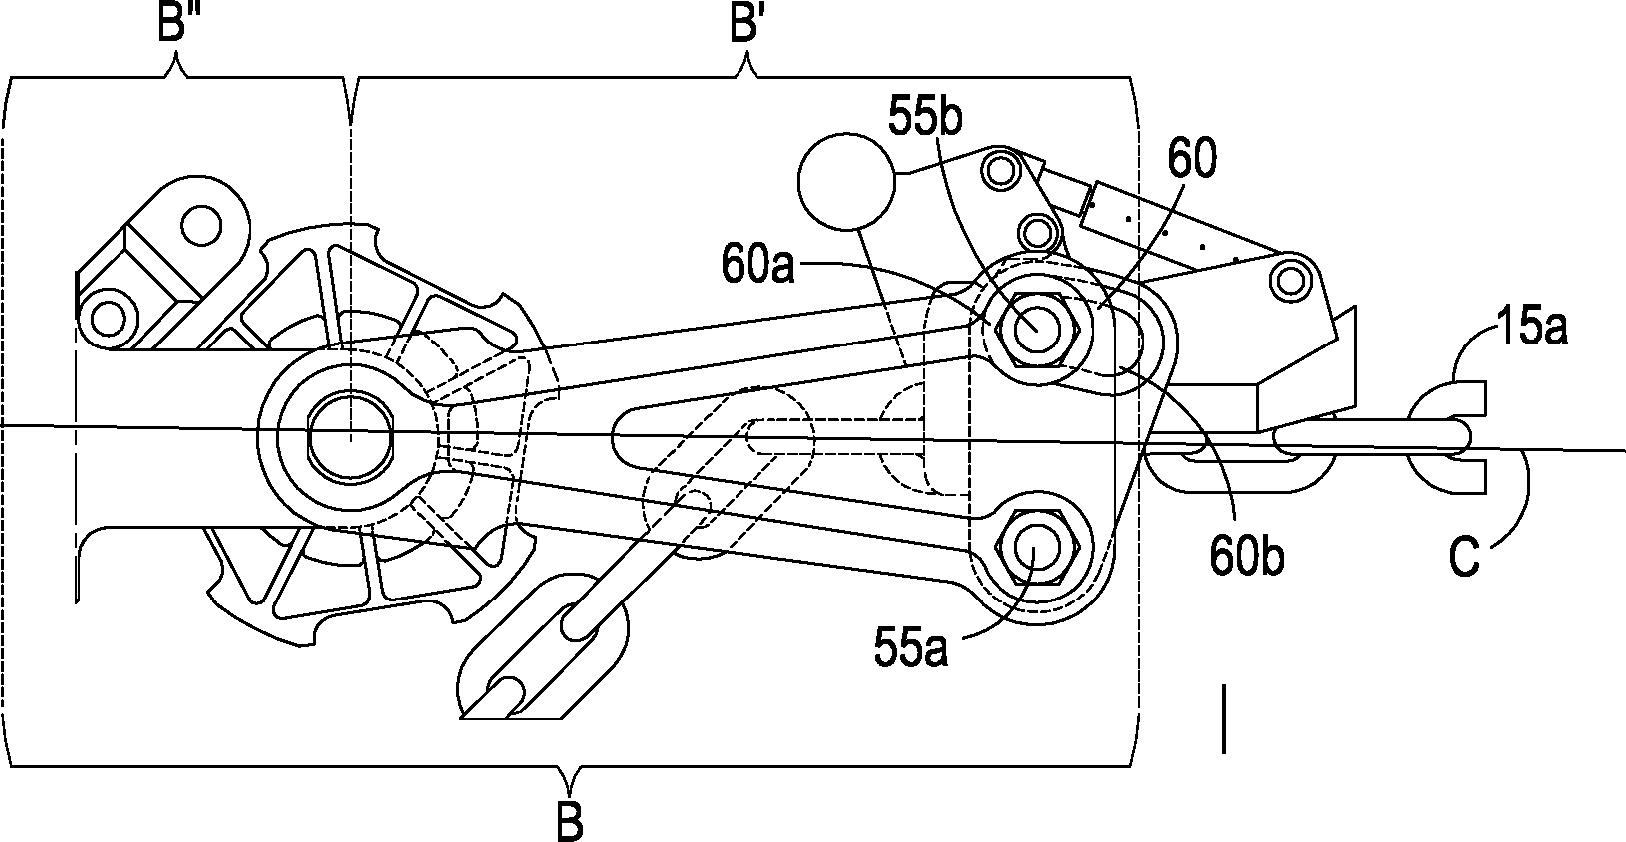 Figure GB2553499A_D0006